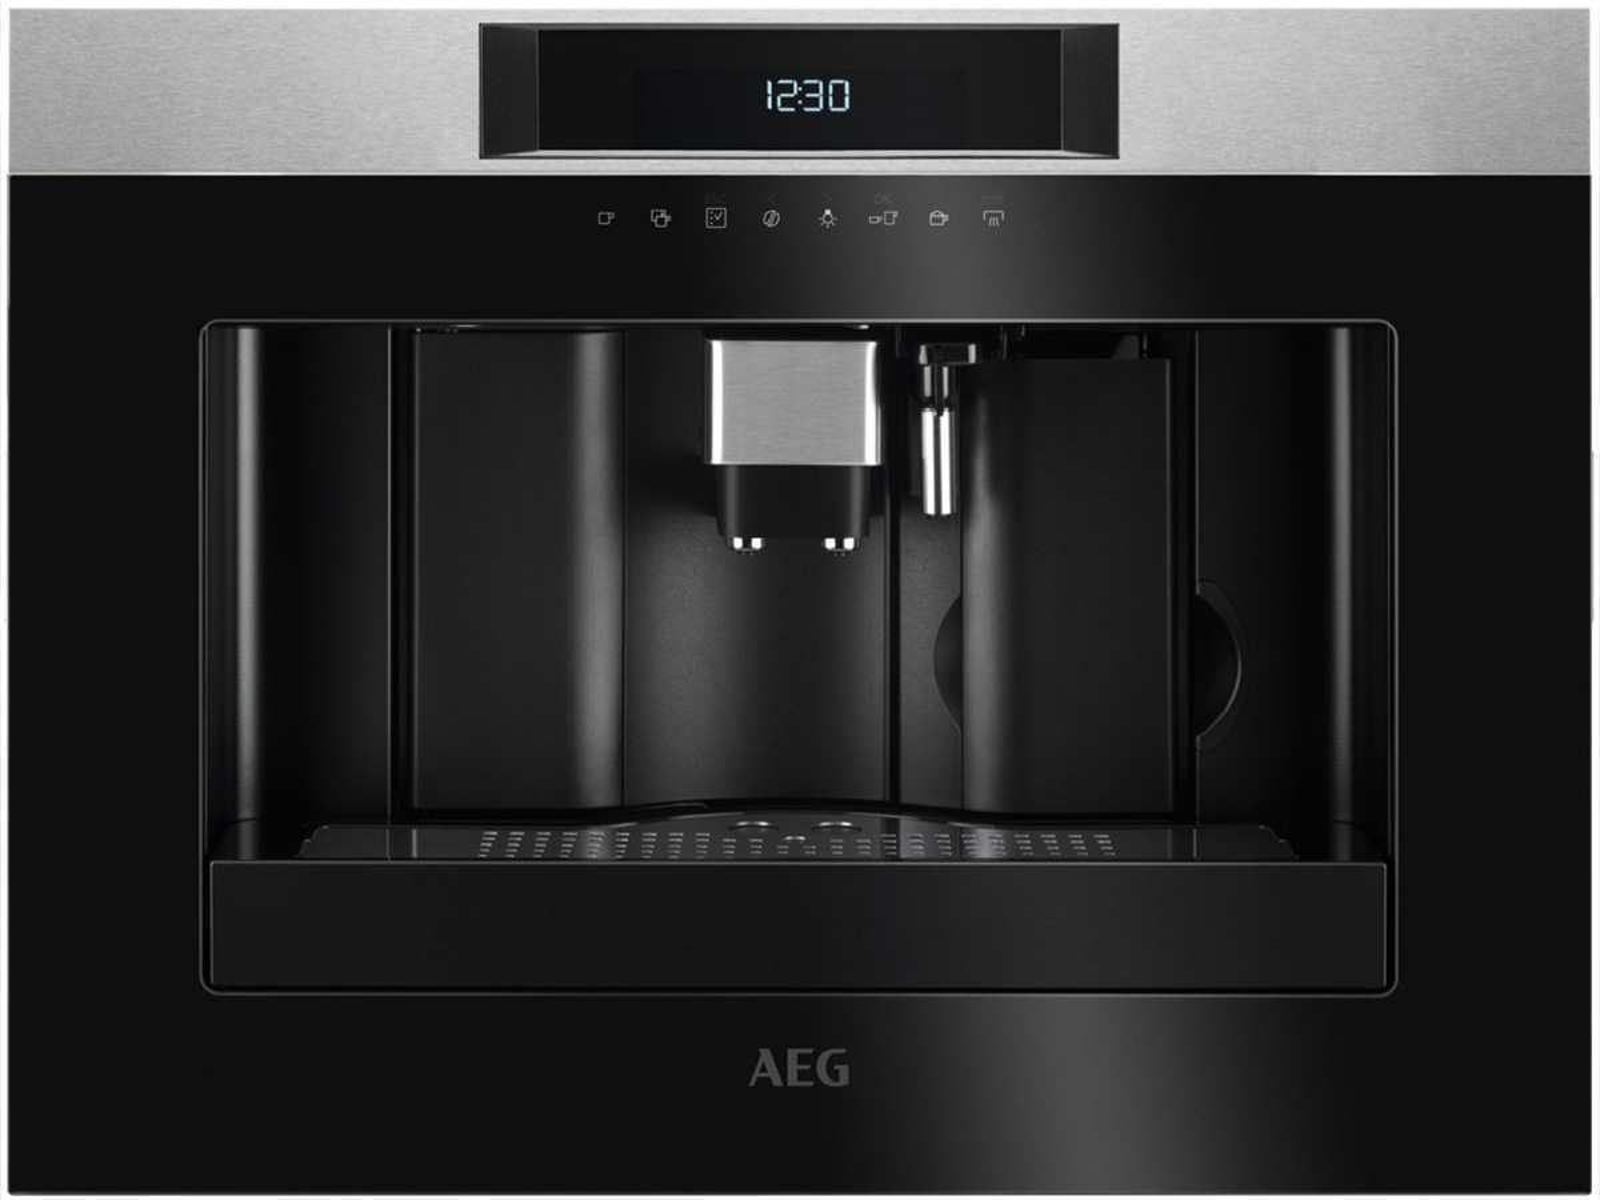 Aeg Kühlschrank Einbauen Anleitung : Aeg kkk m einbau espresso kaffeevollautomat edelstahl